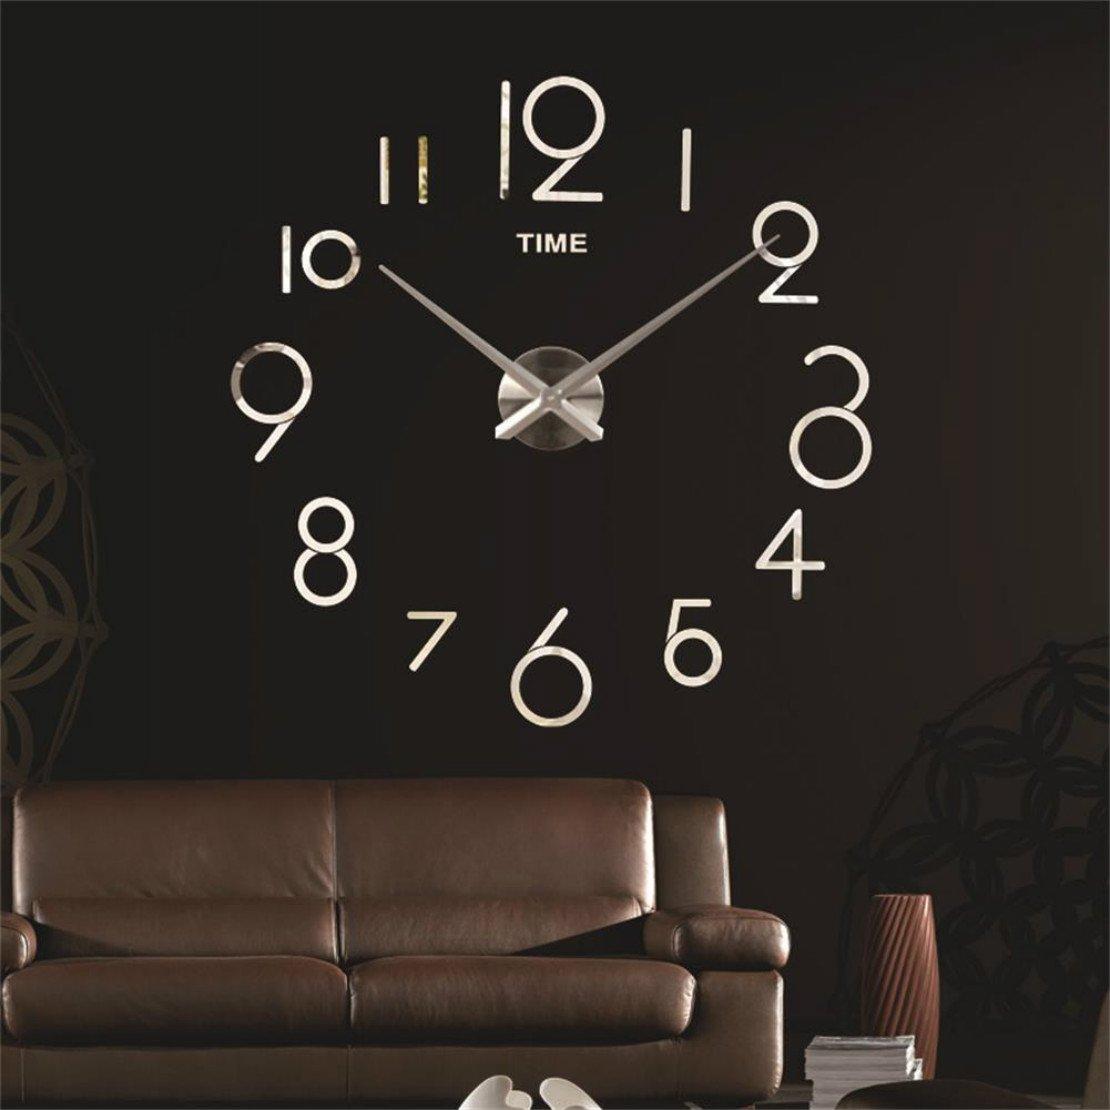 3D Wall Clock DIY Large Sticker Modern Frameless Home Decor Silver Mirror For Bedroom Living Room Office Kitchen Bar Art Digital Clock Plate